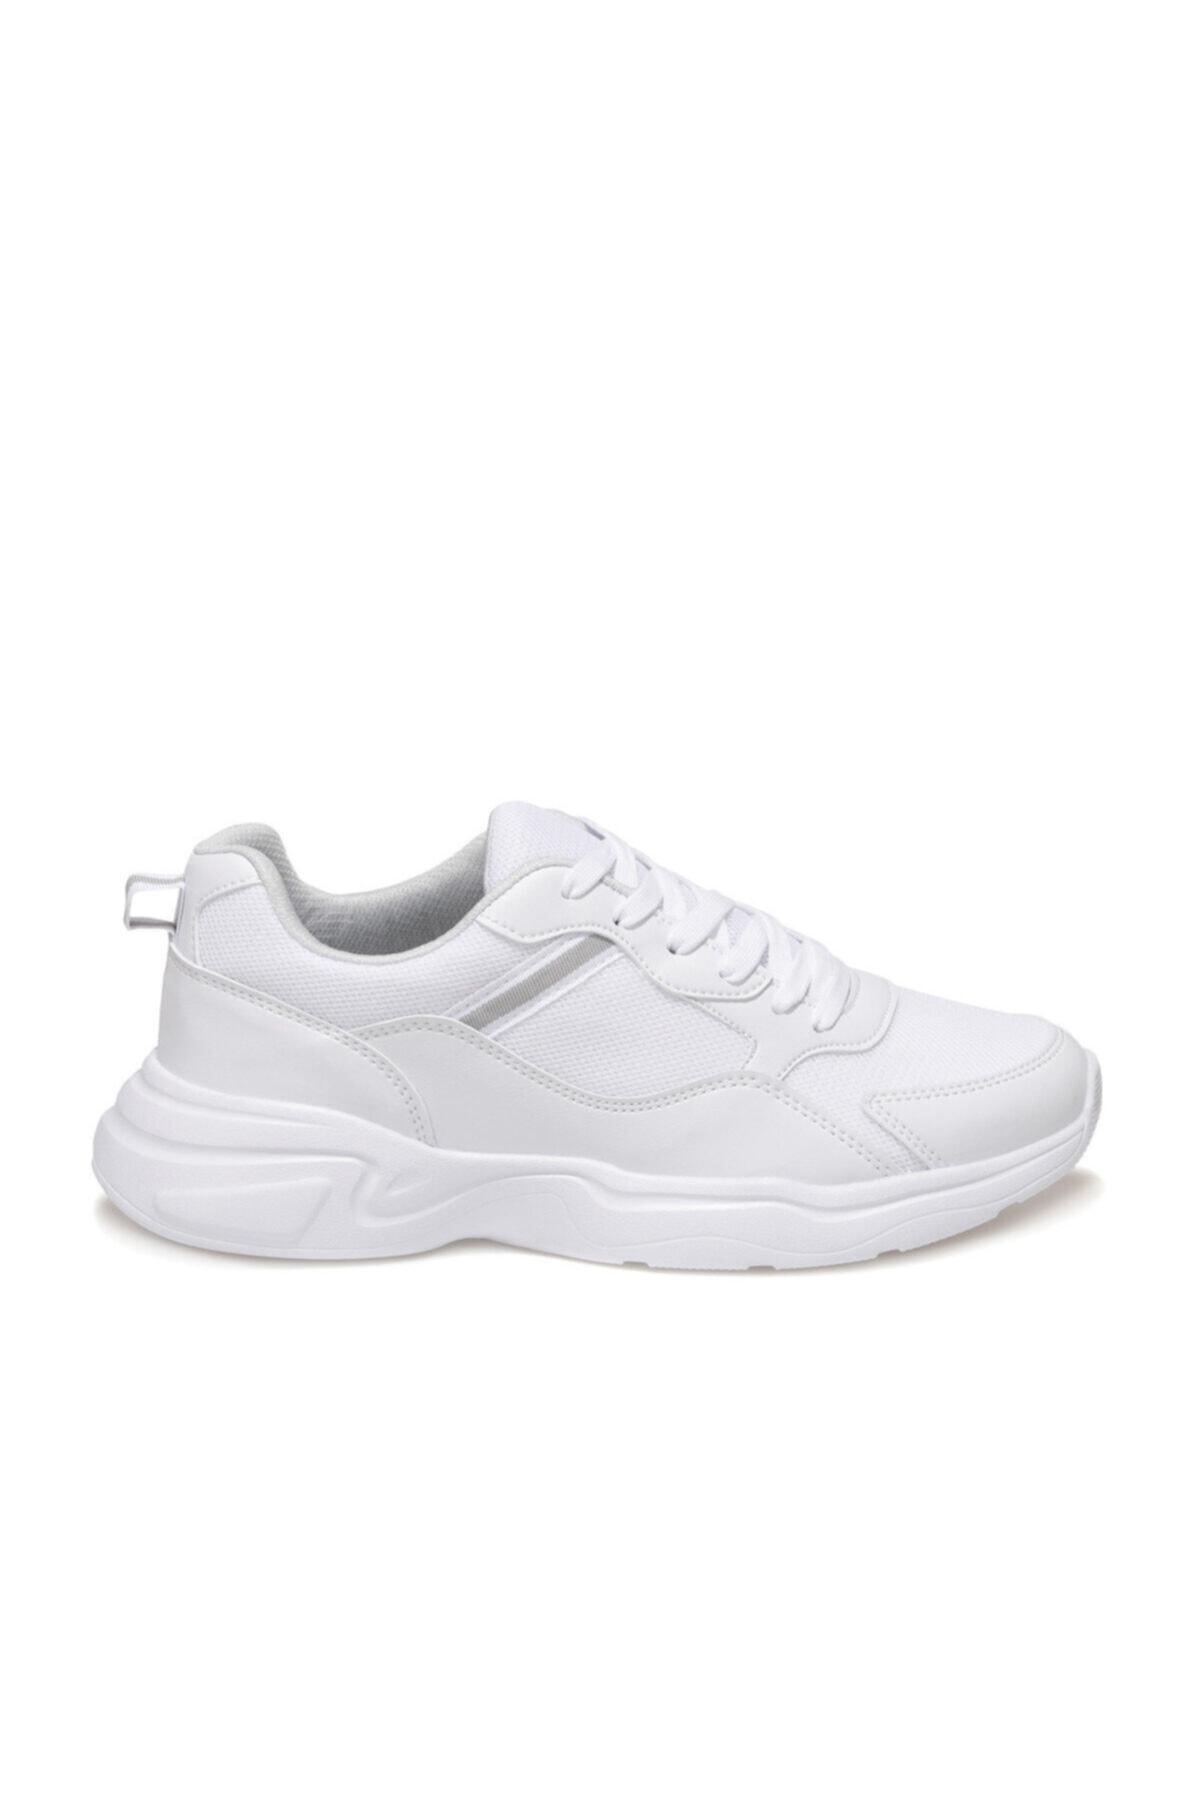 Torex MATEO 1FX Beyaz Erkek Sneaker Ayakkabı 101018315 2